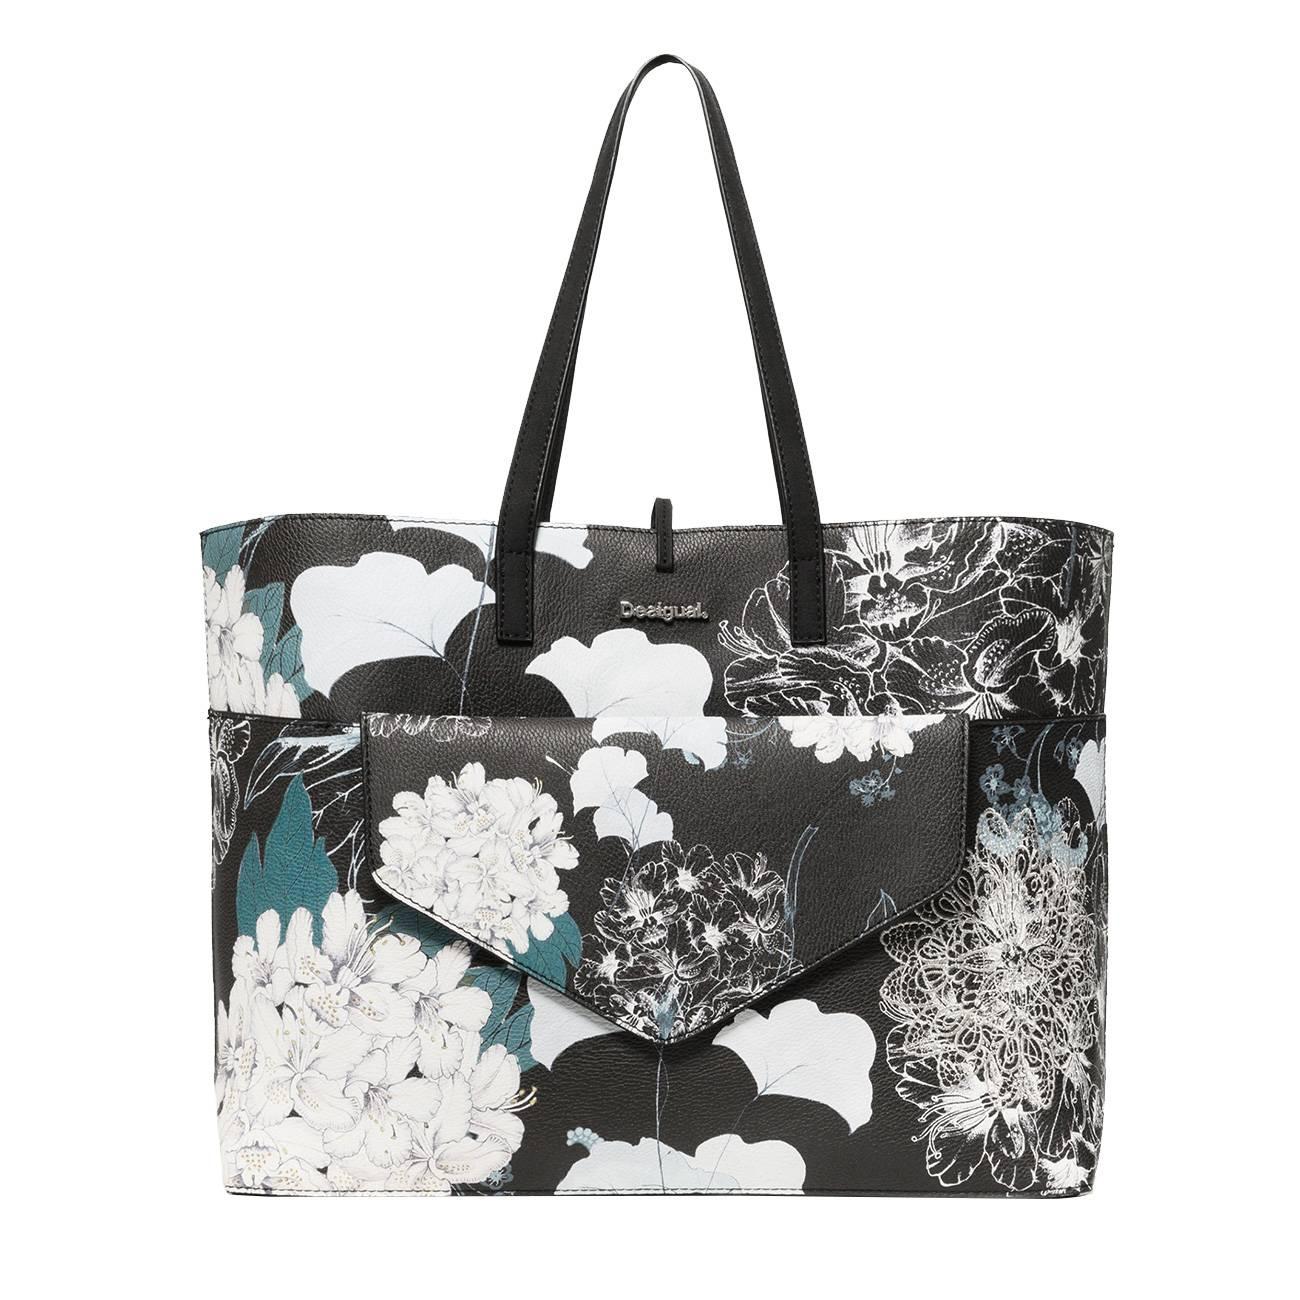 ARCADIA SEATTLE SHOPPER BAG